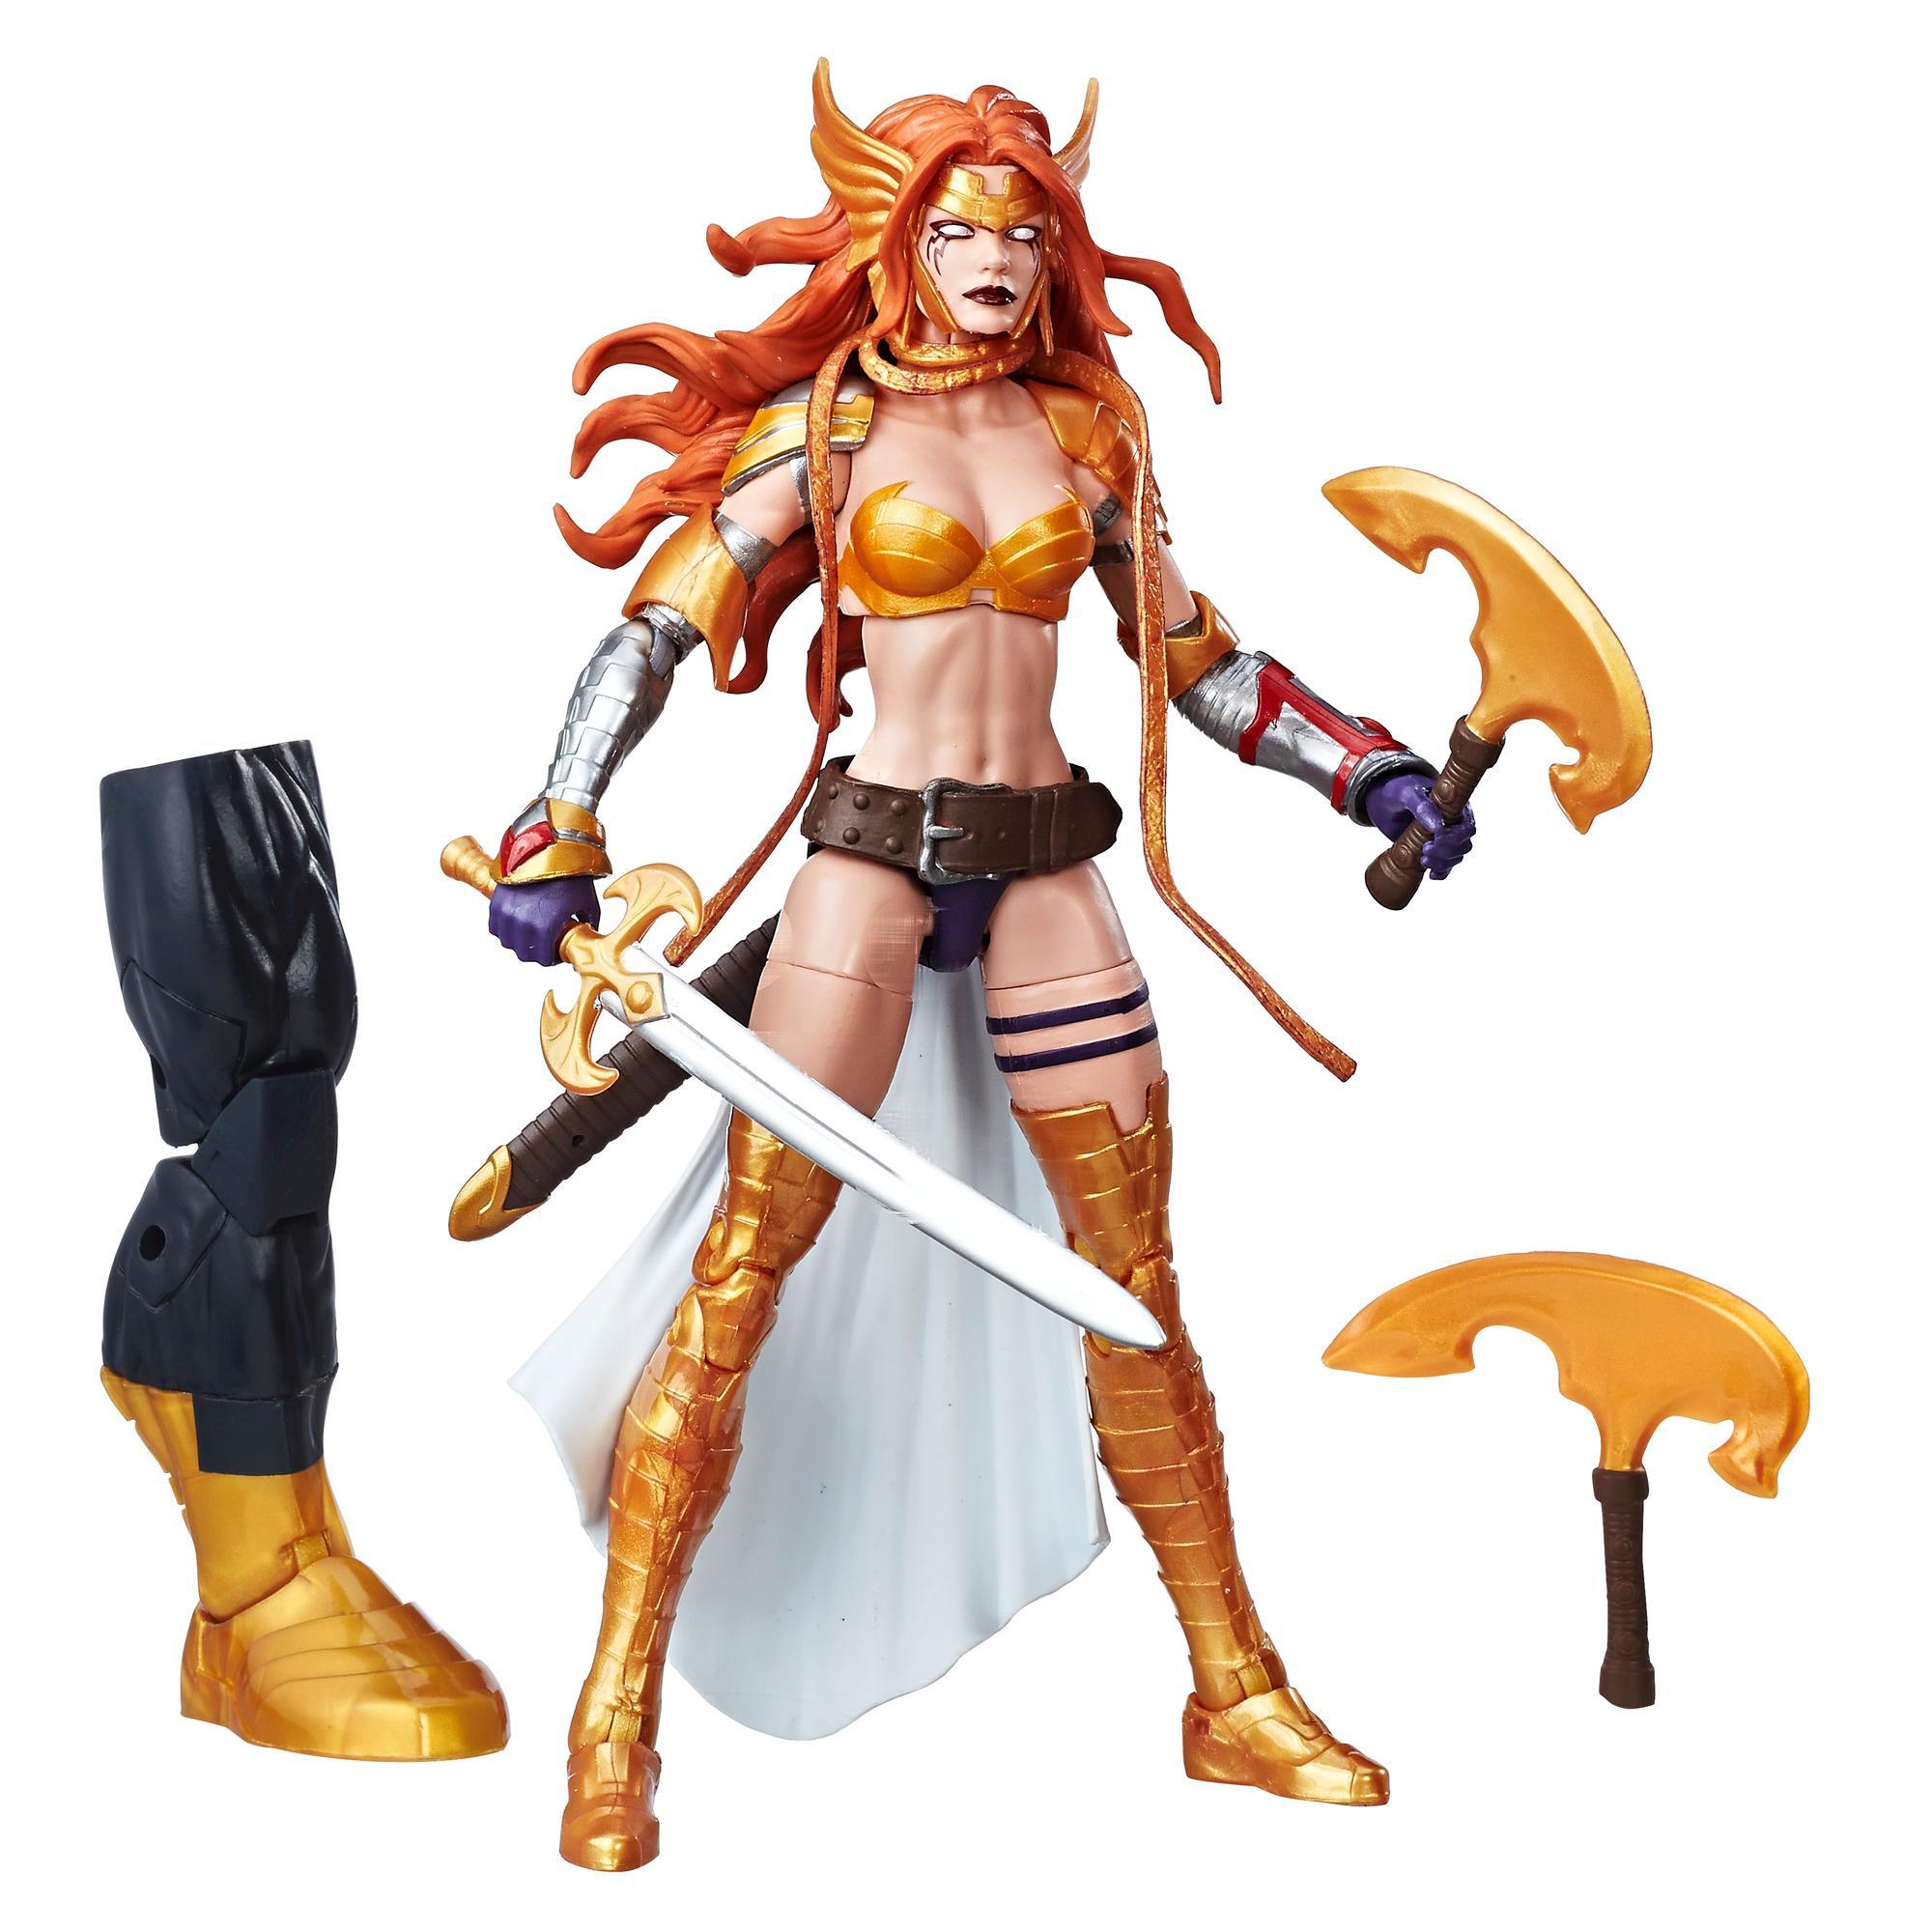 Marvel Guardians of the Galaxy Legends Series - Figurine Marvel's Angela de 15 cm